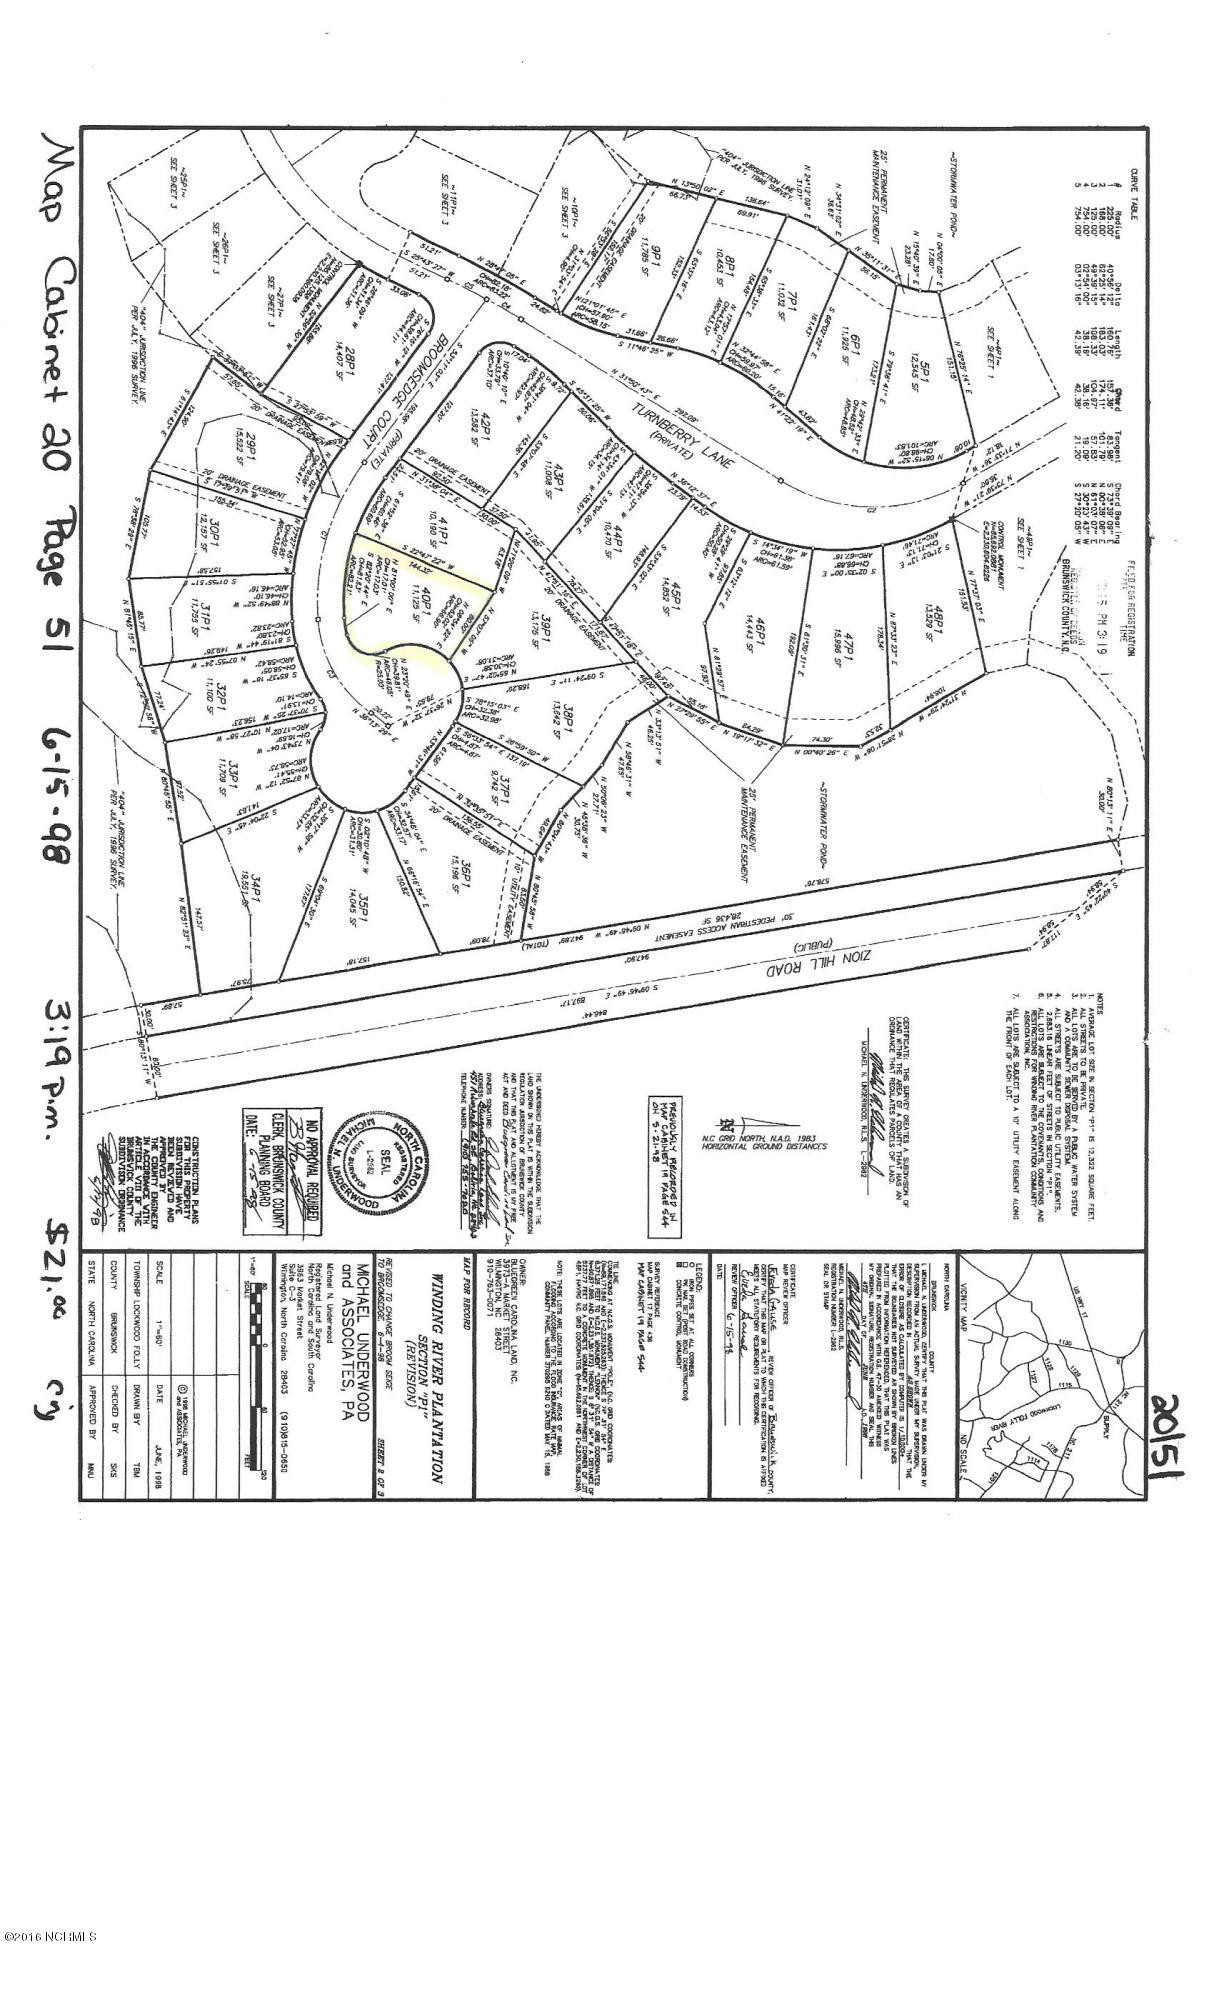 488 Broomsedge Court, Bolivia, North Carolina 28422, ,Residential land,For sale,Broomsedge,100012380